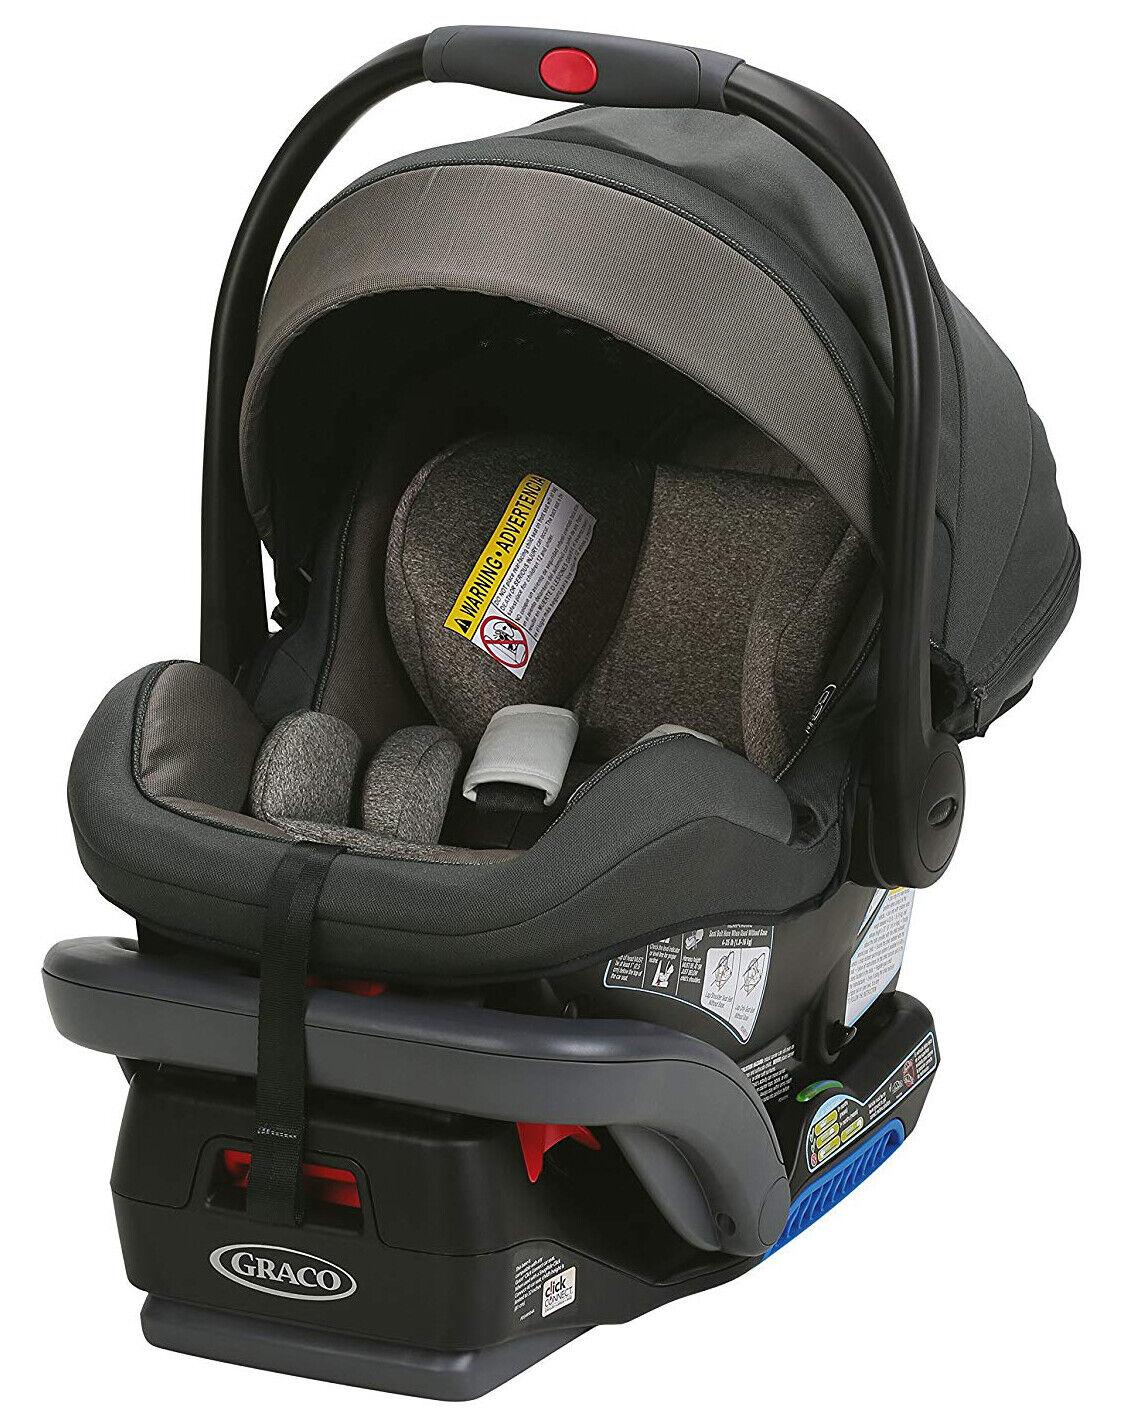 Graco SnugRide SnugLock 35 Platinum XT Infant Car Seat, Brya